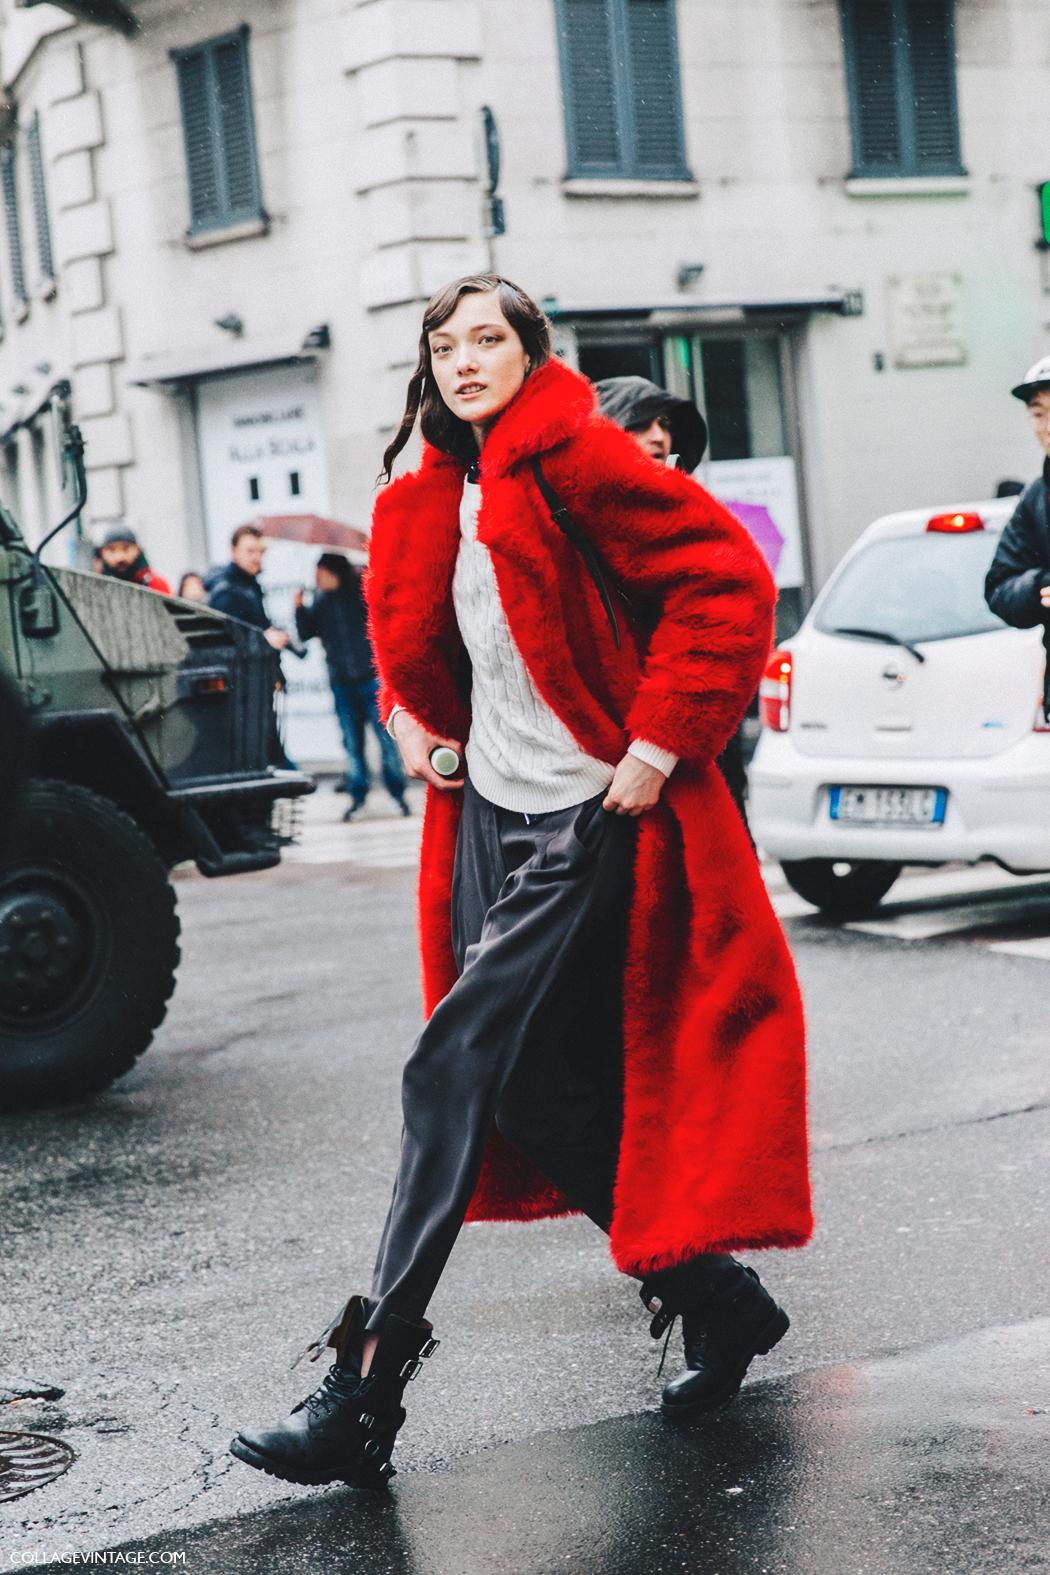 Milan_Fashion_Week_Fall_16-MFW-Street_Style-Collage_Vintage-Red_Fur_Coat-Model-